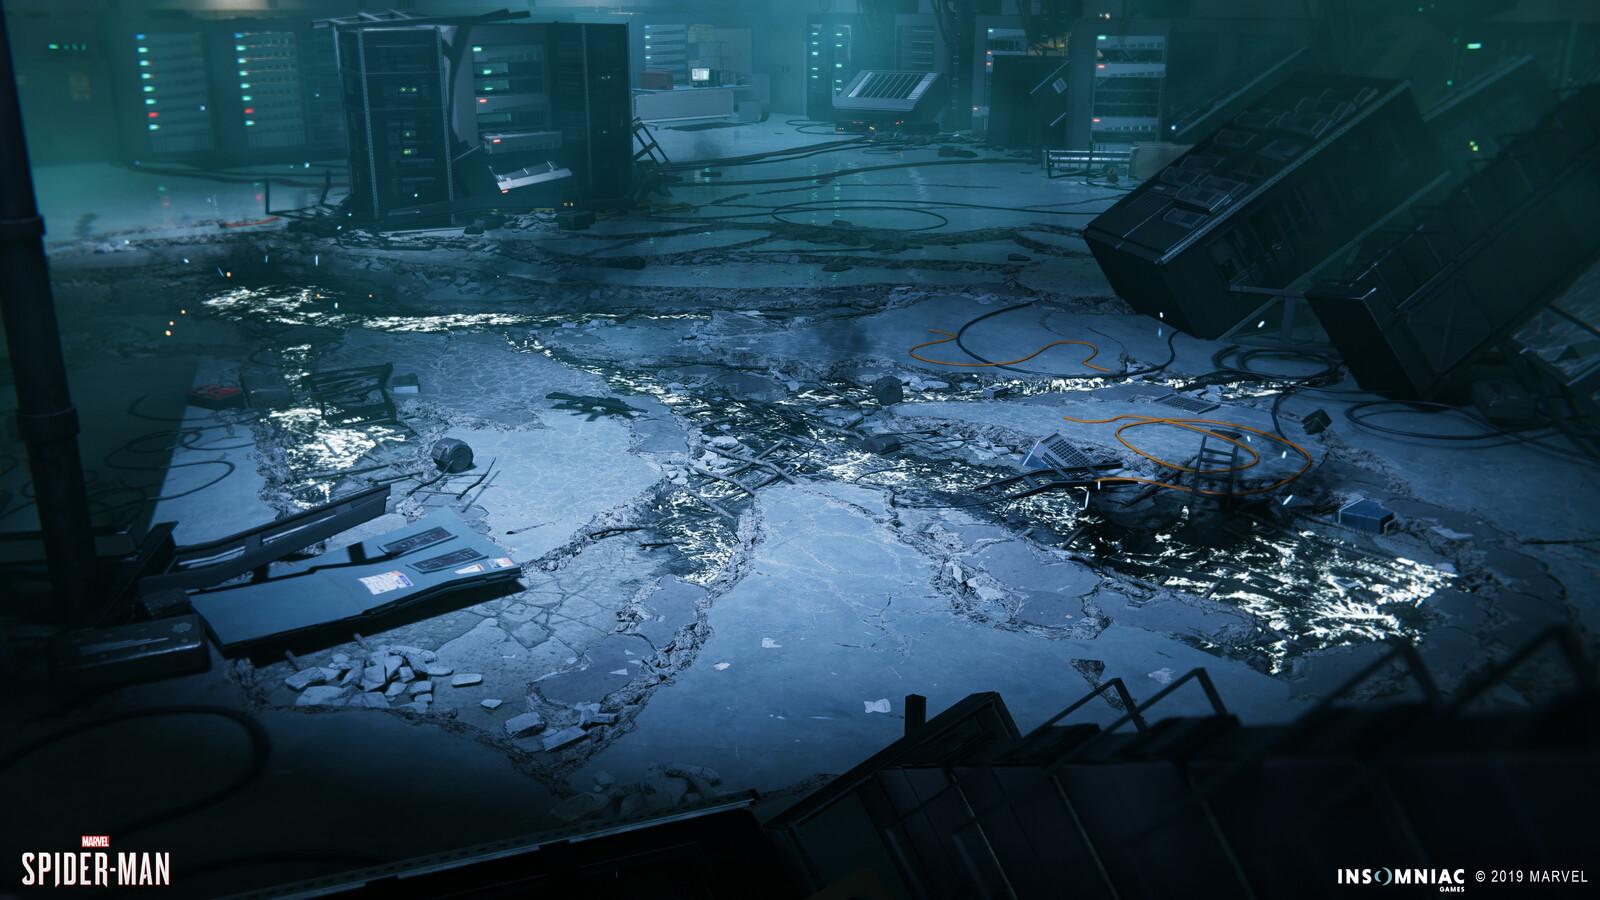 SPIDER-MAN PS4 - Cinematic Floor Destruction